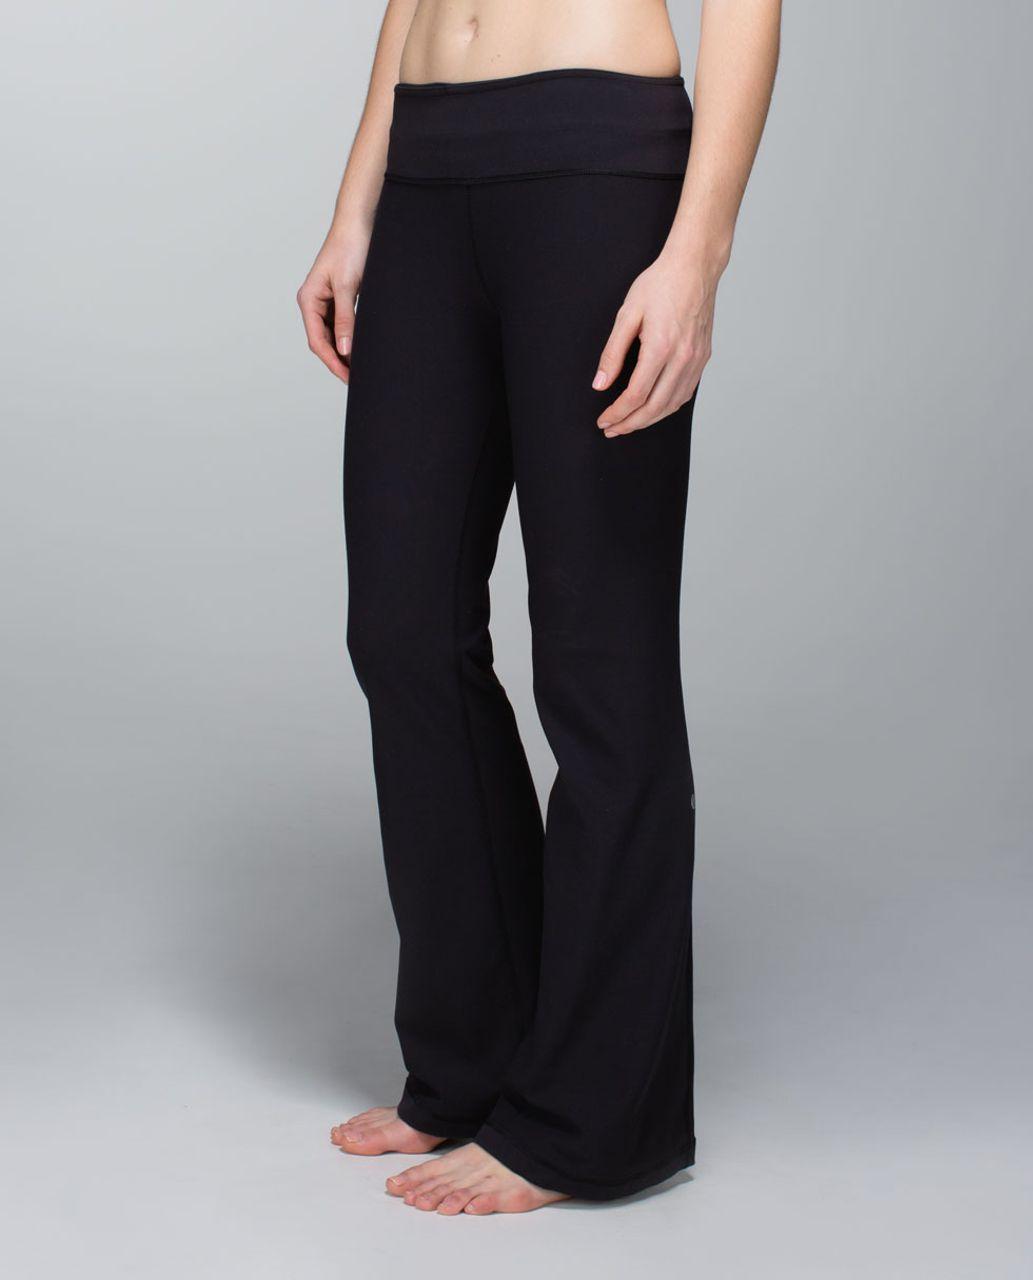 Lululemon Groove Pant *Brushed (Regular) - Black